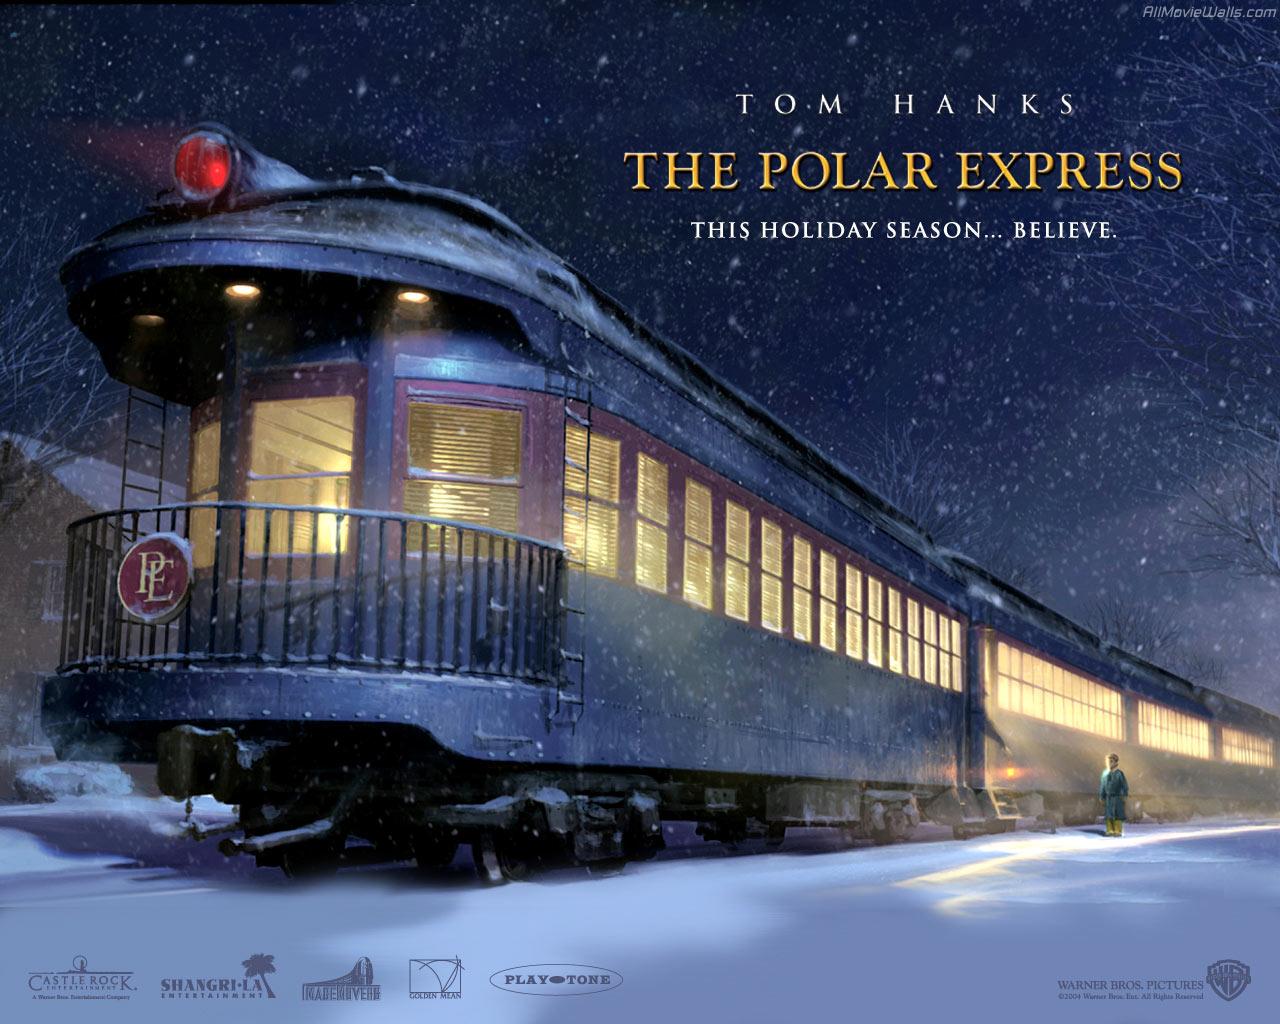 The Polar Express sleighs 'em